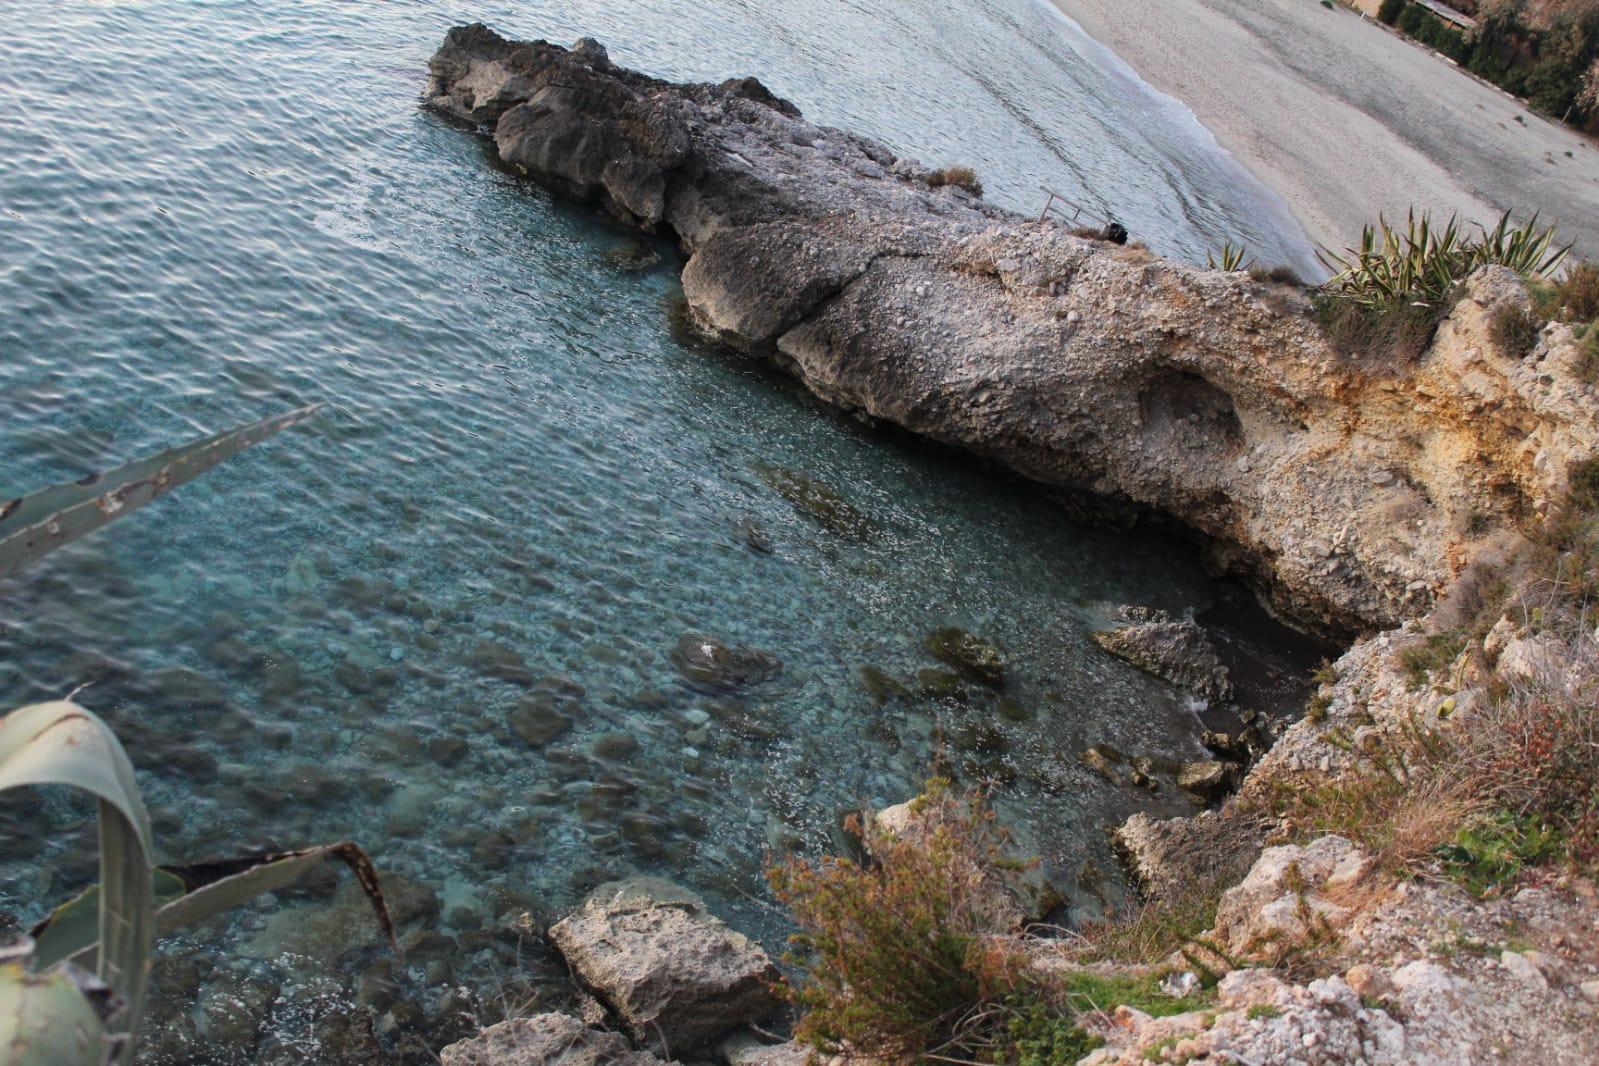 Vacanze al mare estate 2020 a Marina di Camerota